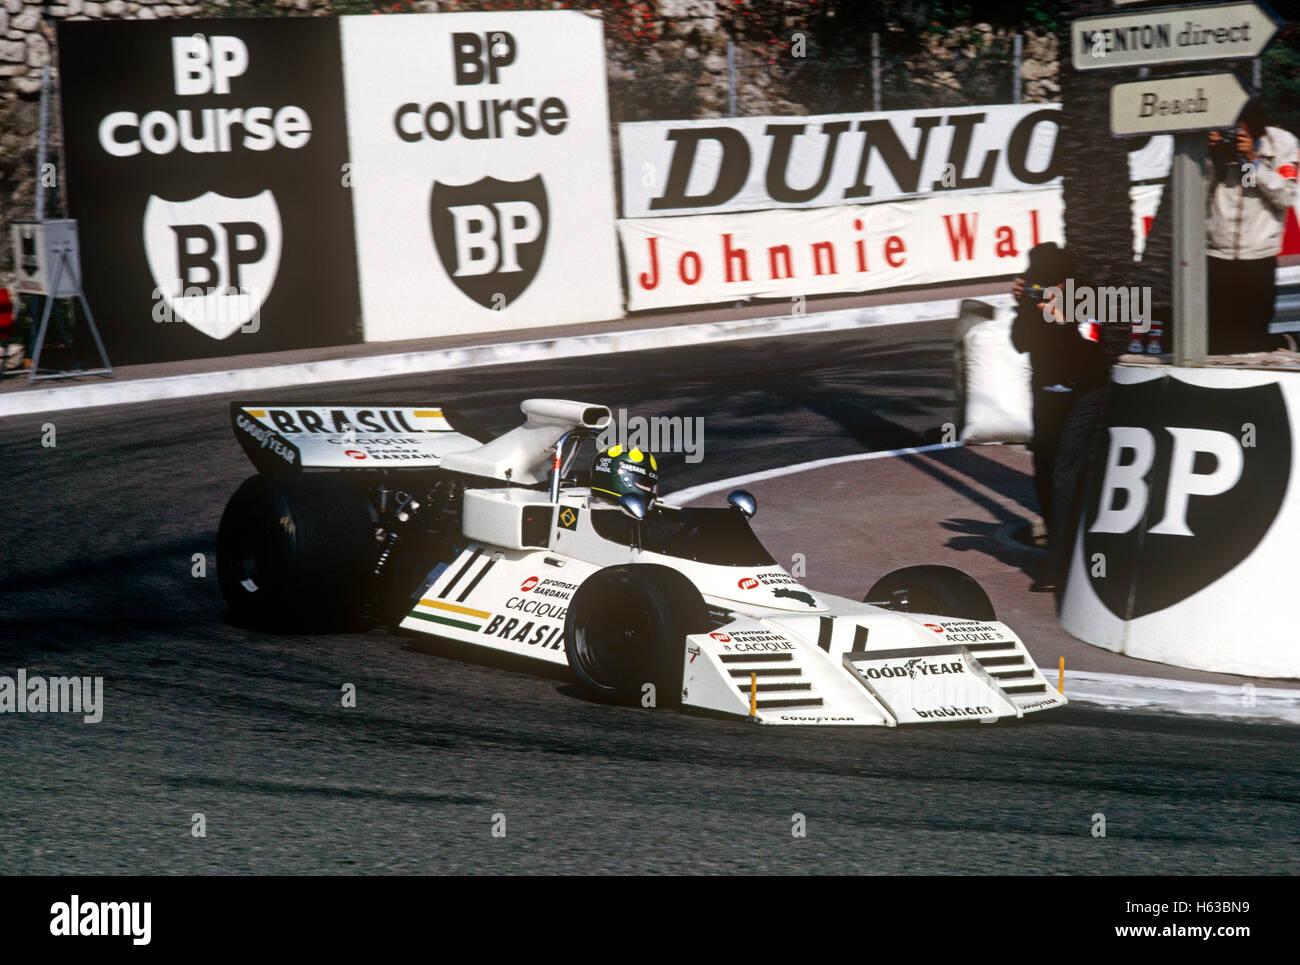 Brabham BT42 racing car Monaco Grand Prix - Stock Image